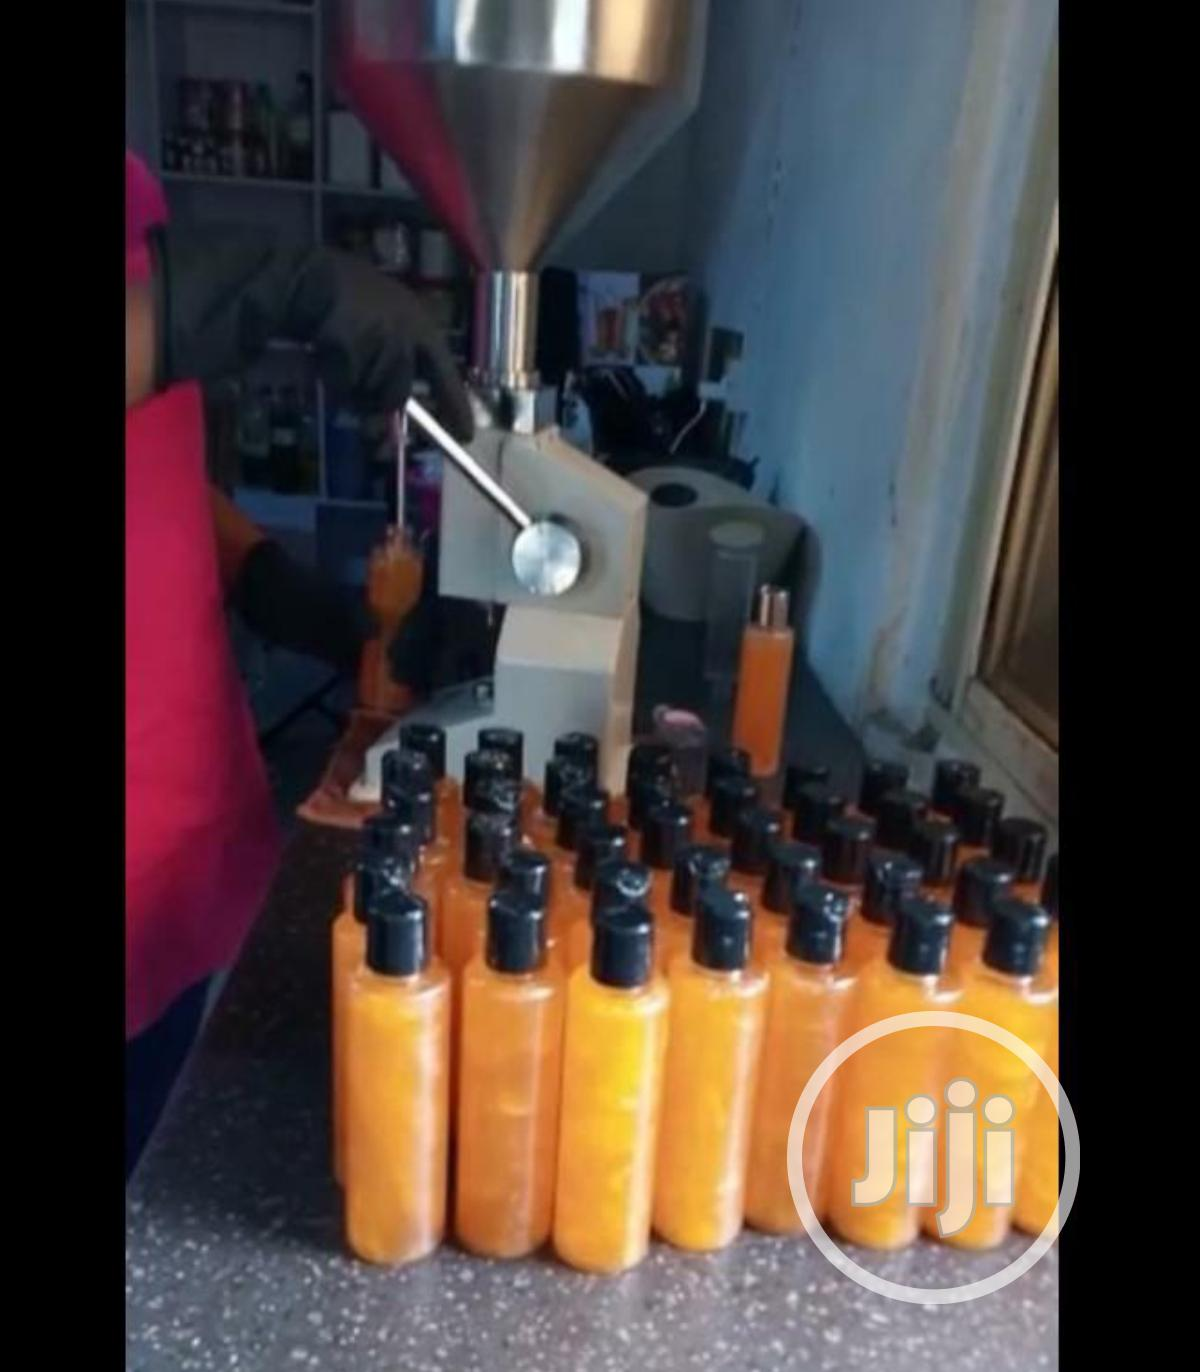 Manual Liquid Filling Machine For Cream Paste Shampoo Cosmetic | Manufacturing Equipment for sale in Ojo, Lagos State, Nigeria